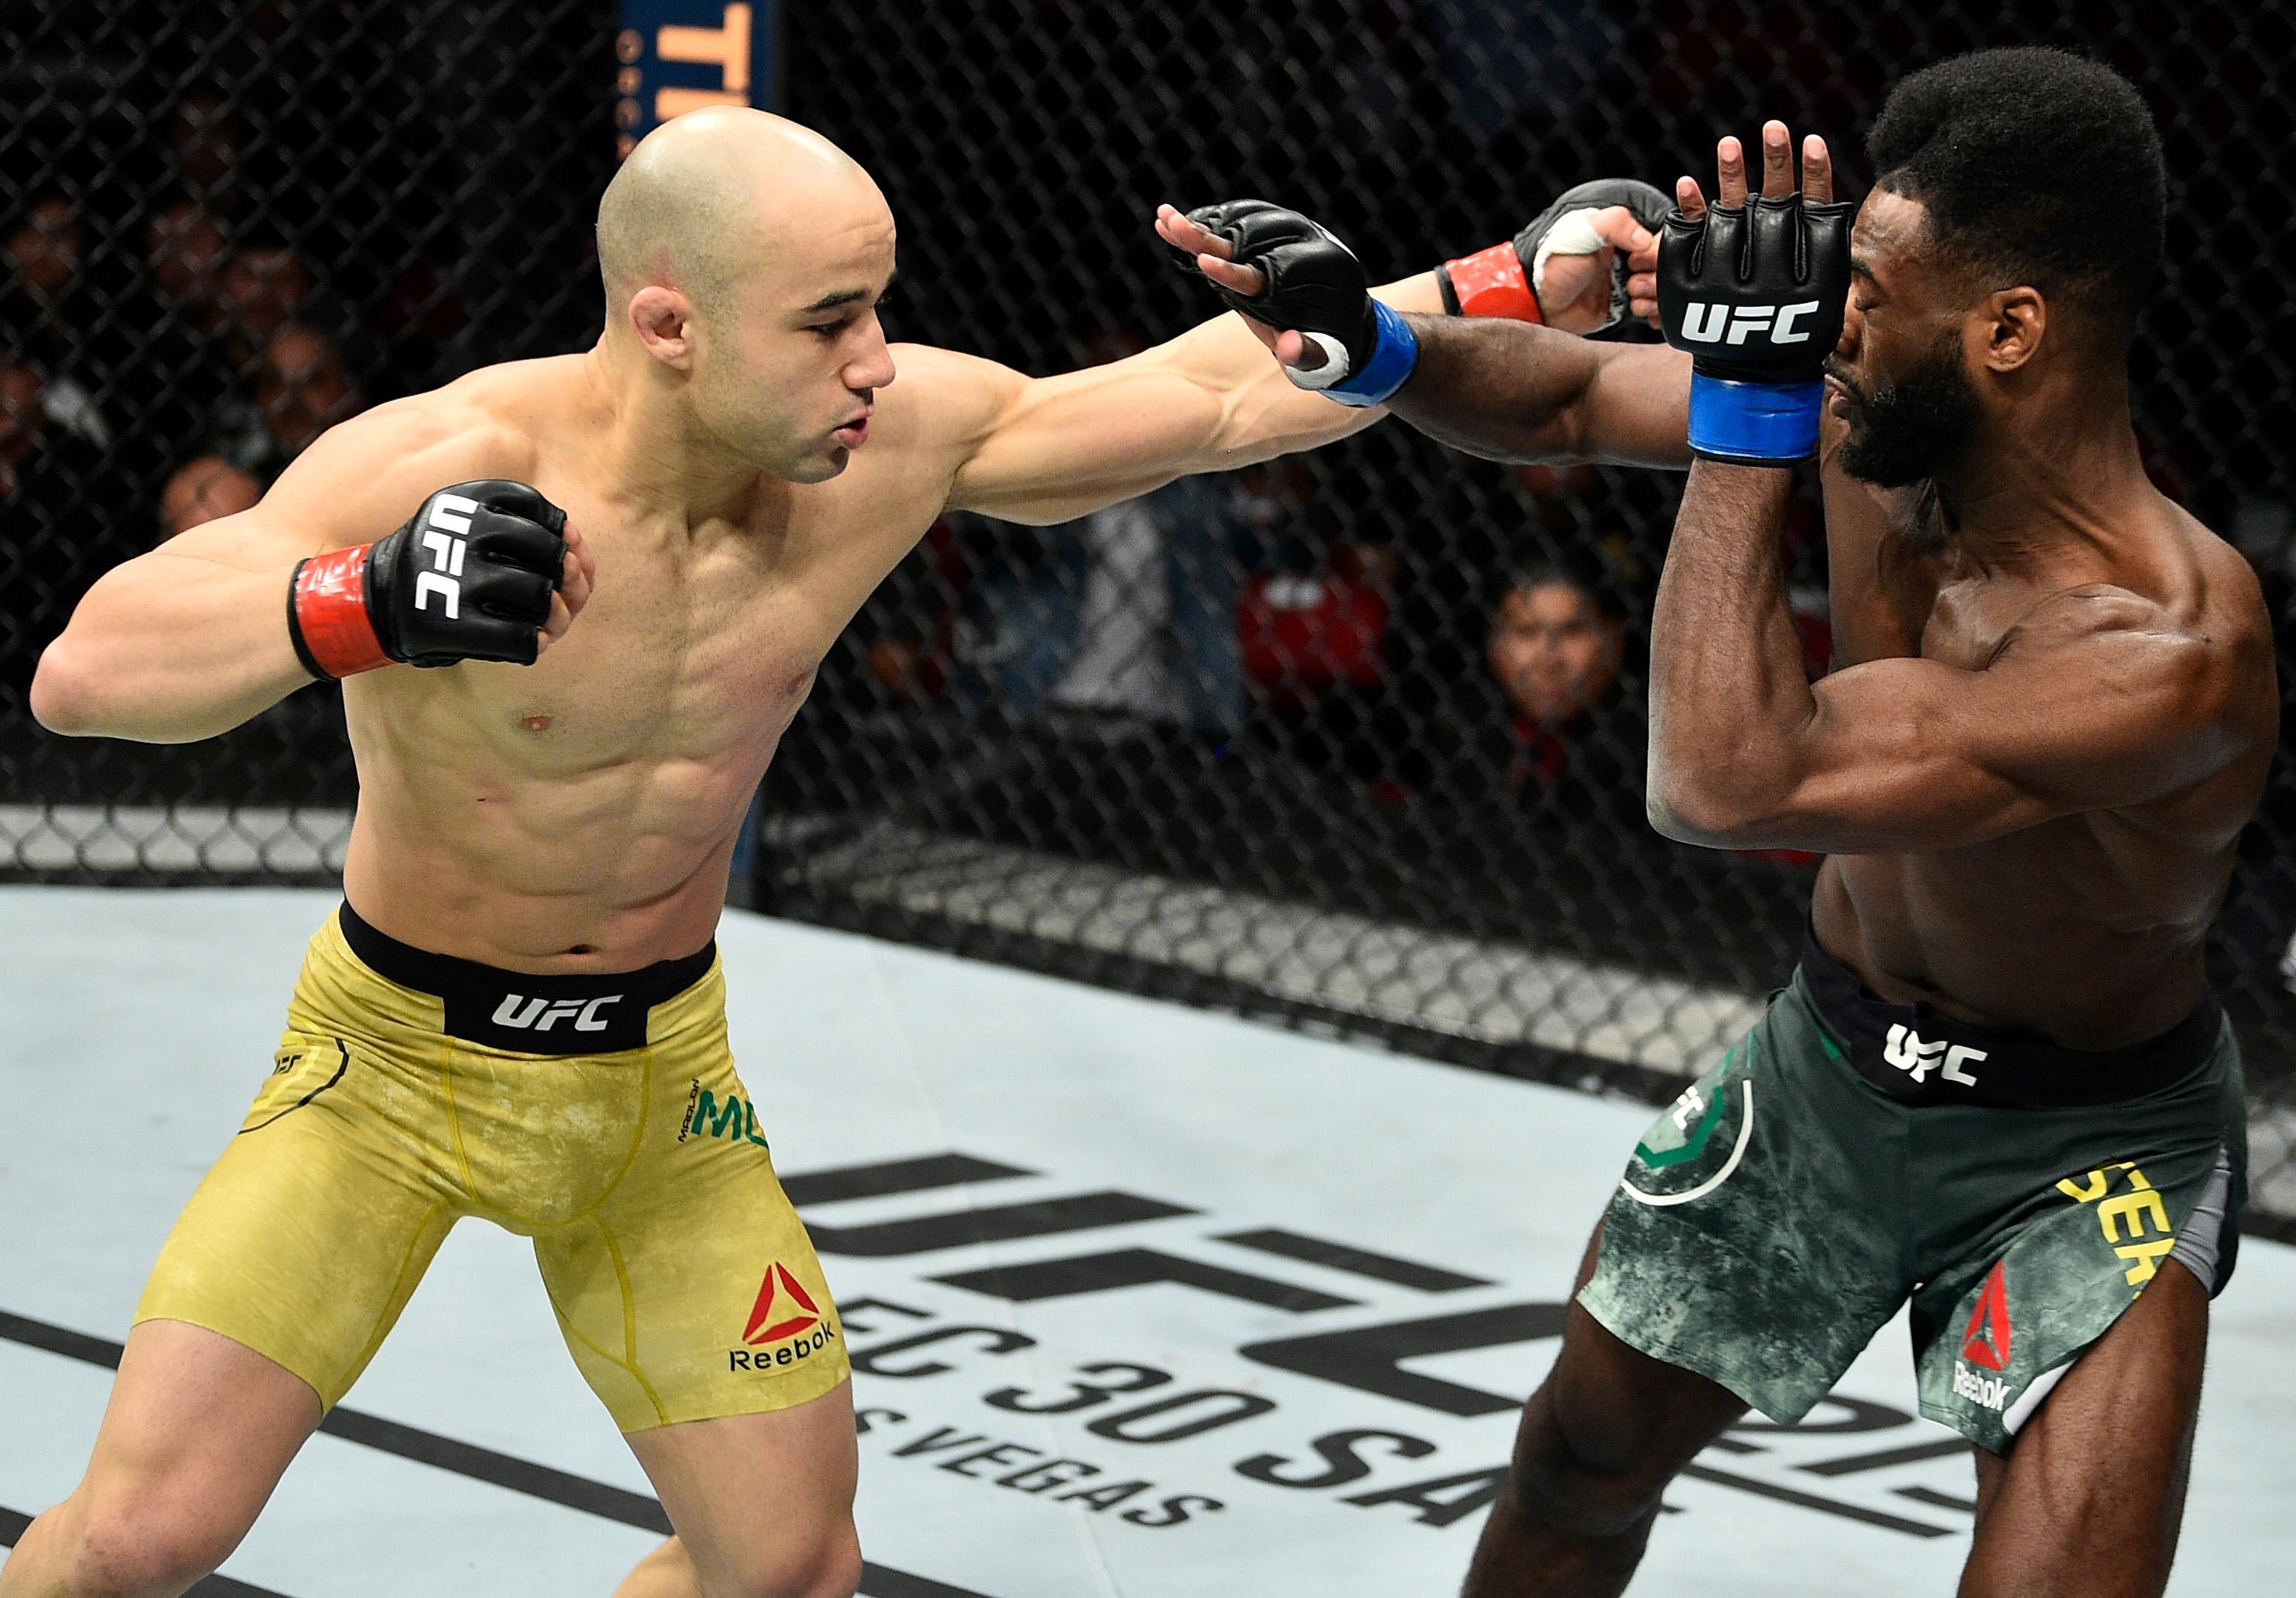 Marlon Moraes defeated Sterling in December 2017 by KO